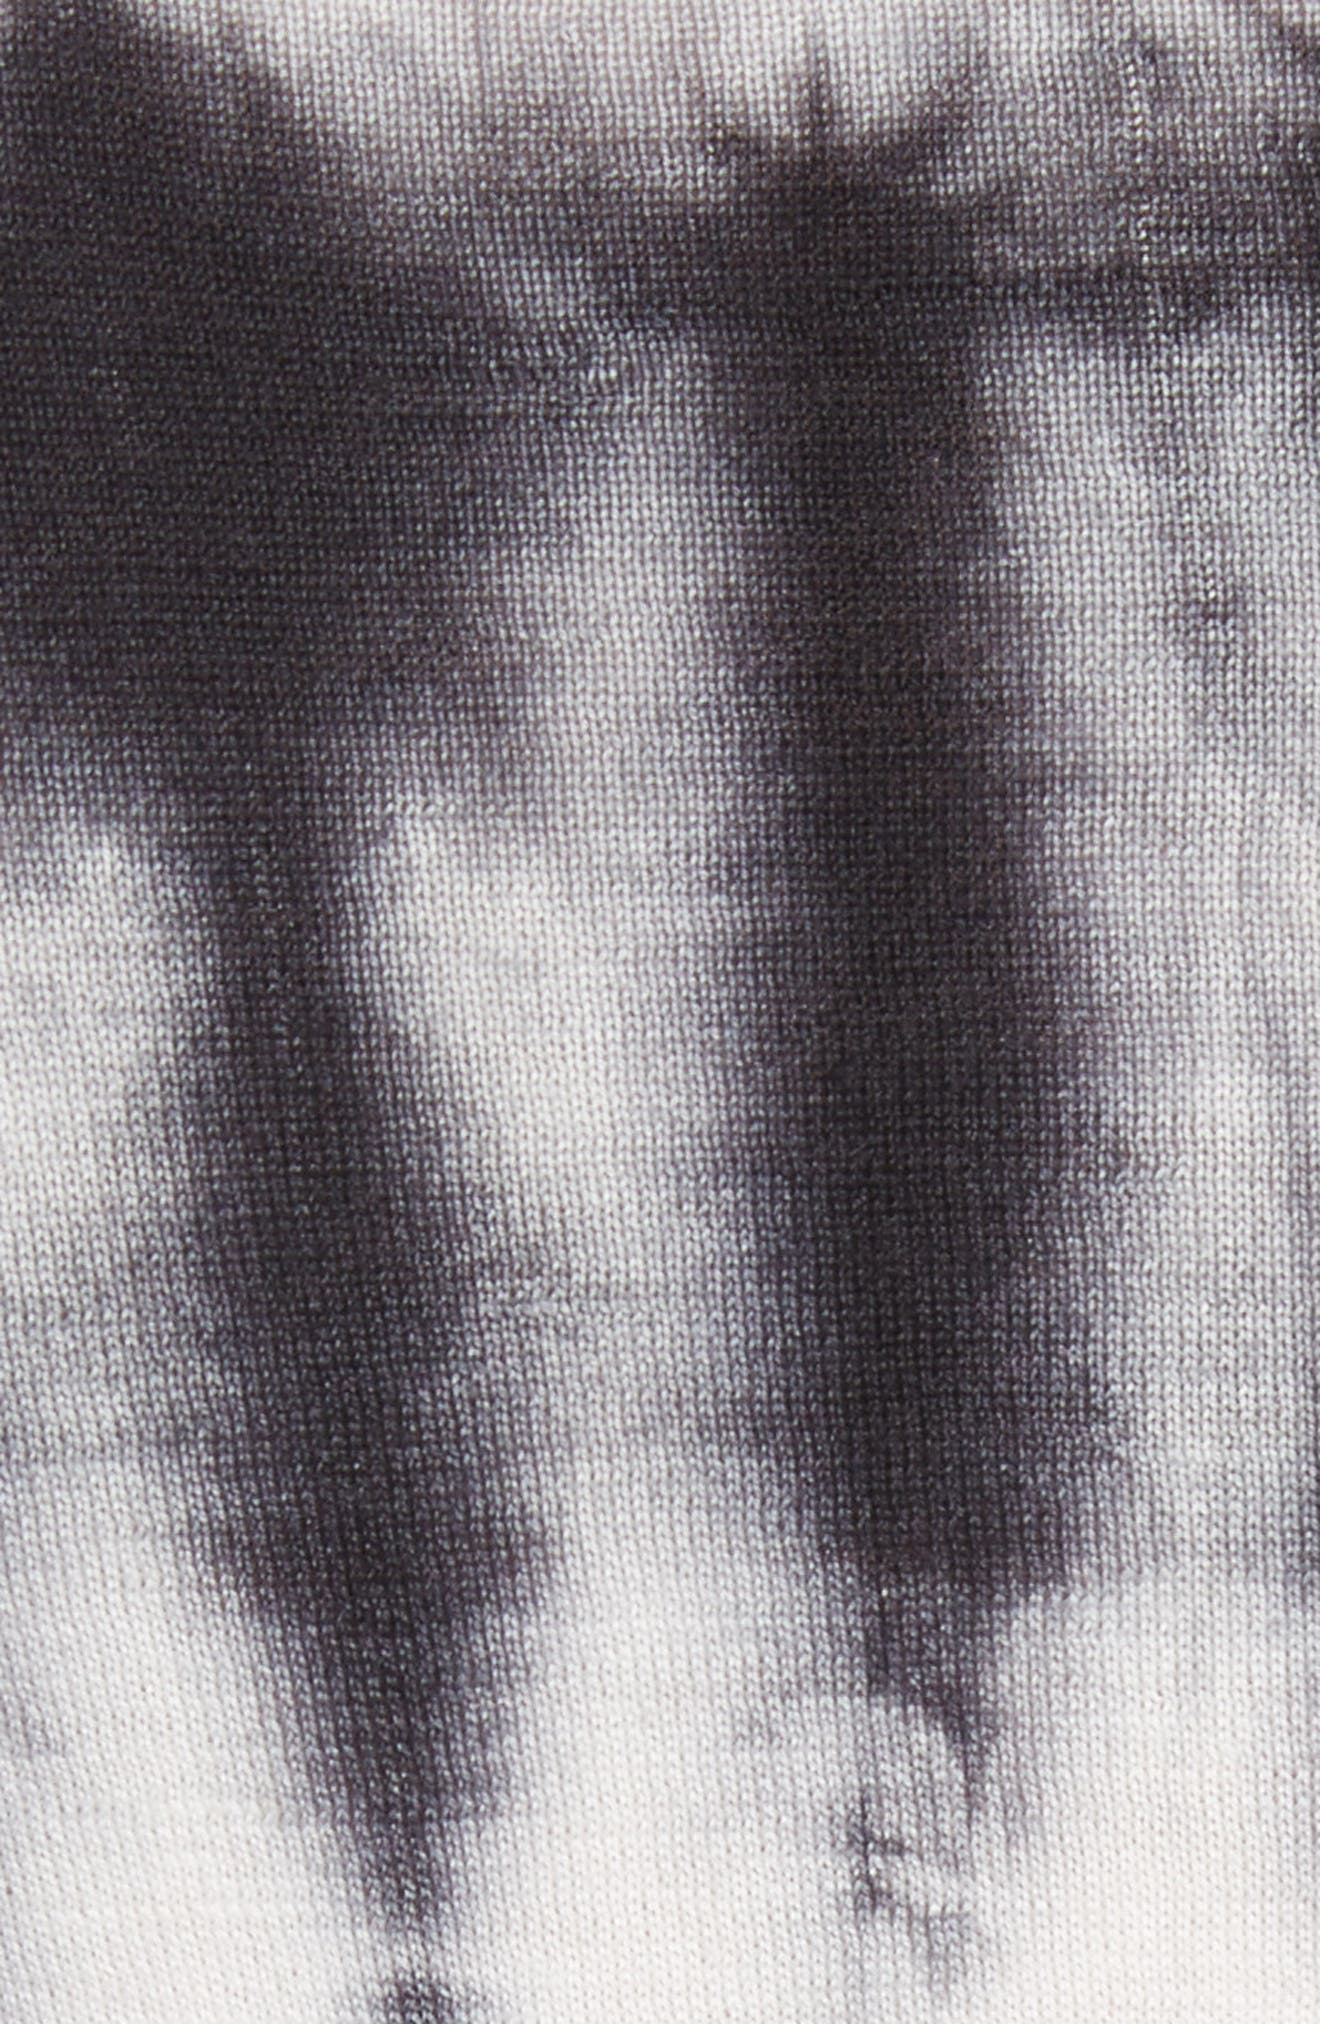 Tie Dye Wool Sweater,                             Alternate thumbnail 5, color,                             Black/ White